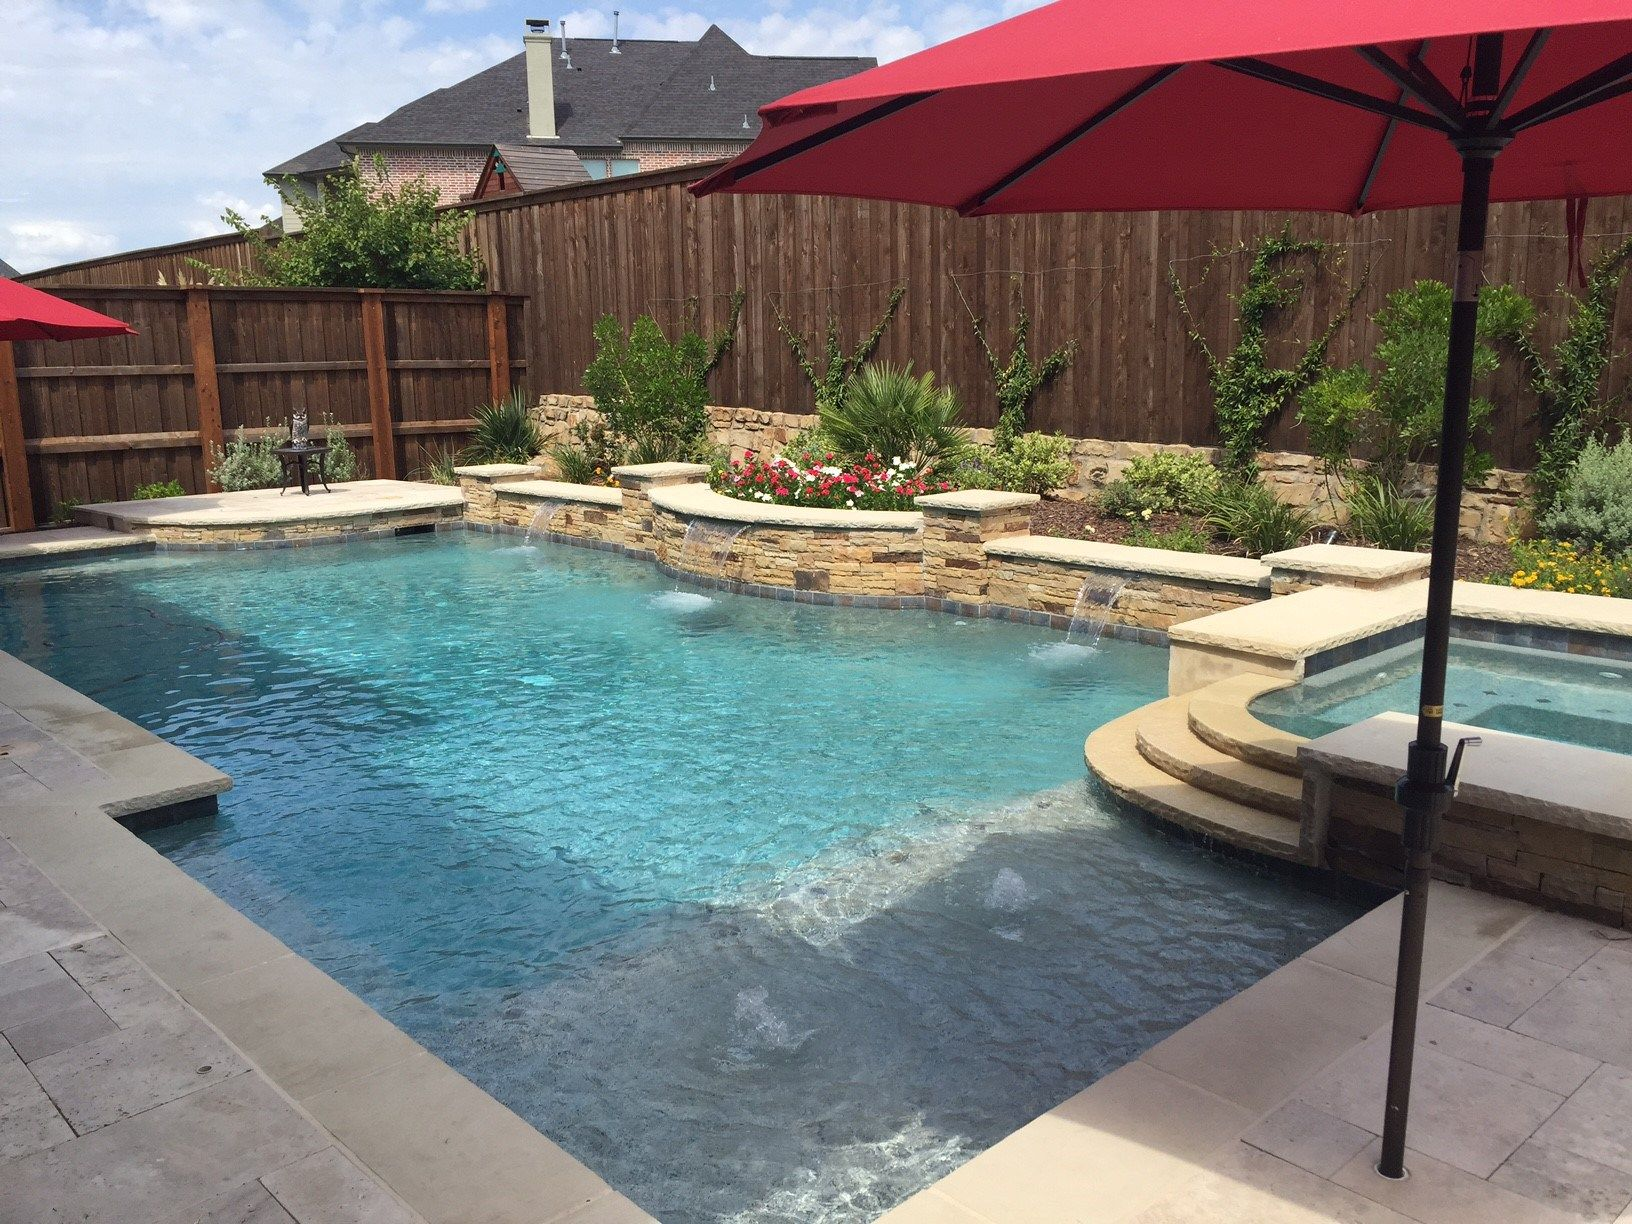 The Formal Pools That Hobert Pools Amp Spas Offers Keeps